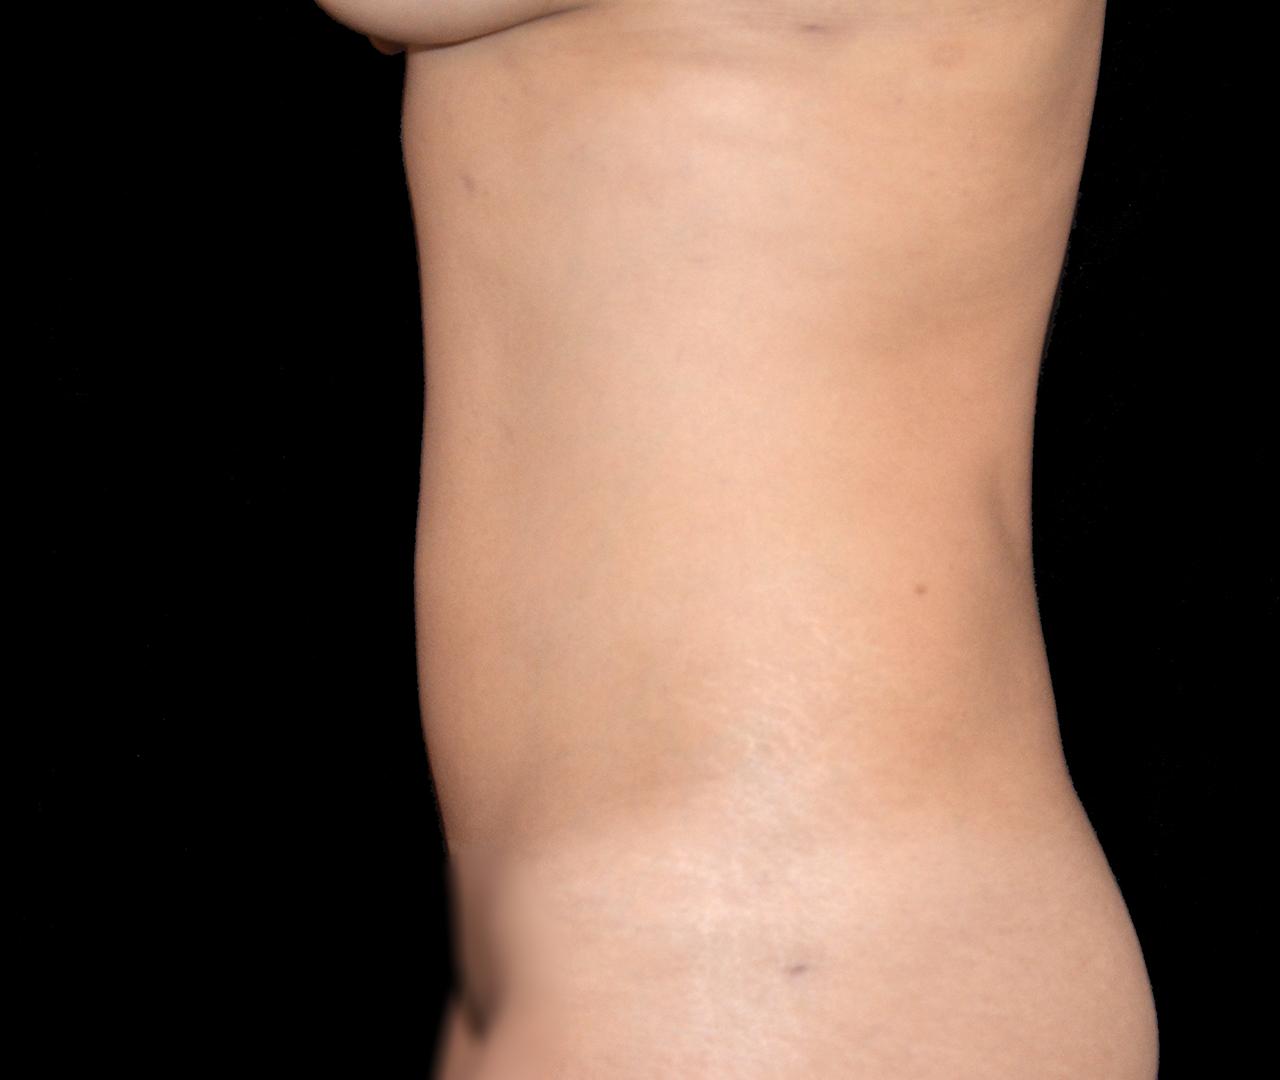 Liposuction Body 4